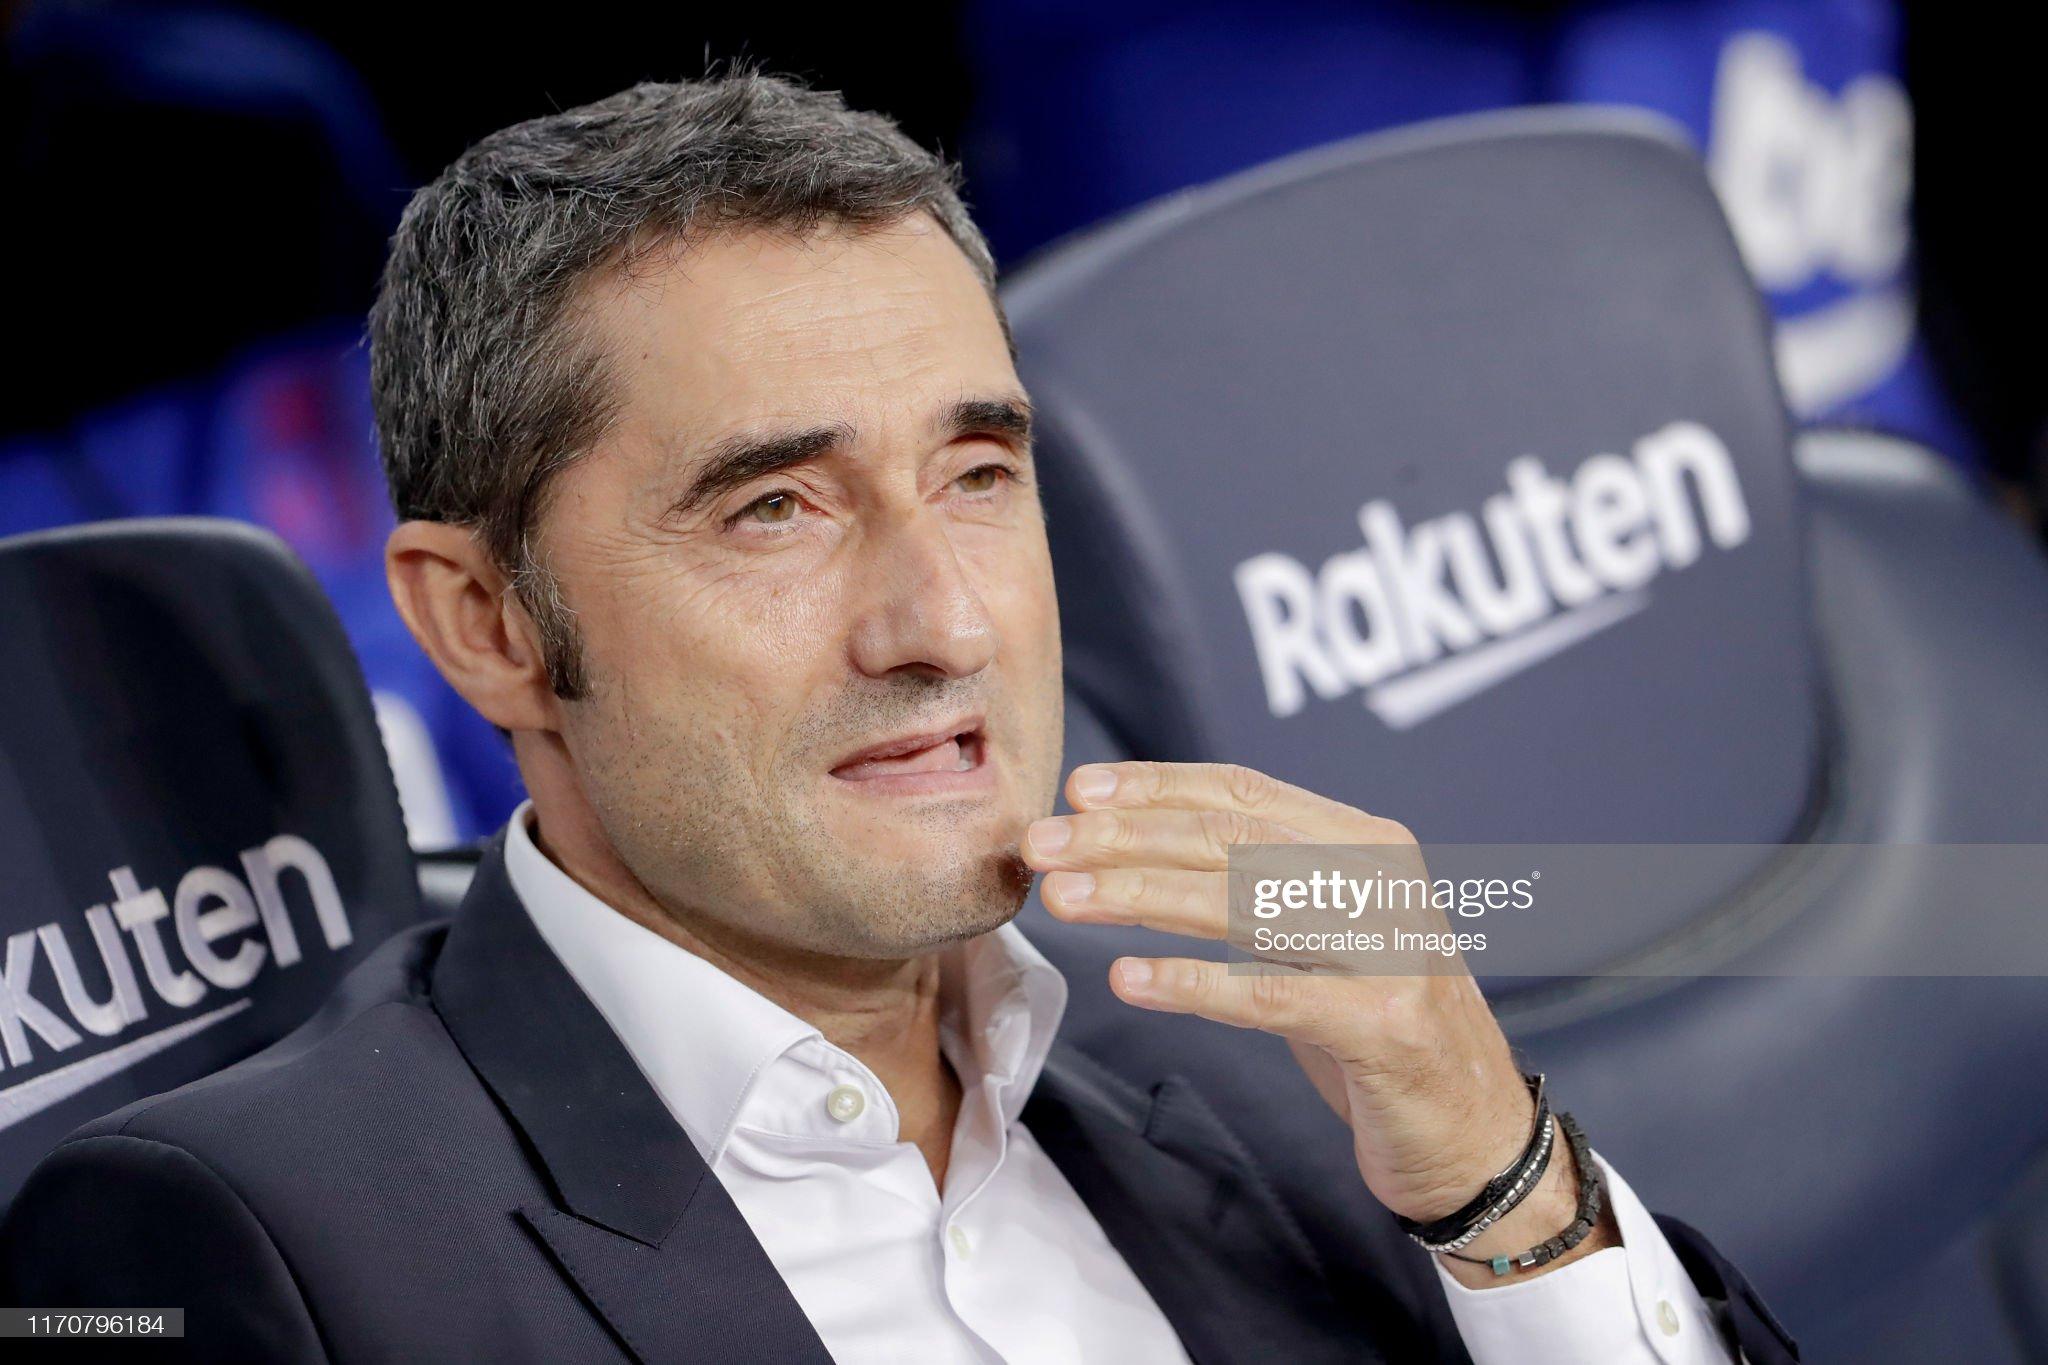 صور مباراة : برشلونة - فياريال 2-1 ( 24-09-2019 )  Coach-ernesto-valverde-of-fc-barcelona-during-the-la-liga-santander-picture-id1170796184?s=2048x2048